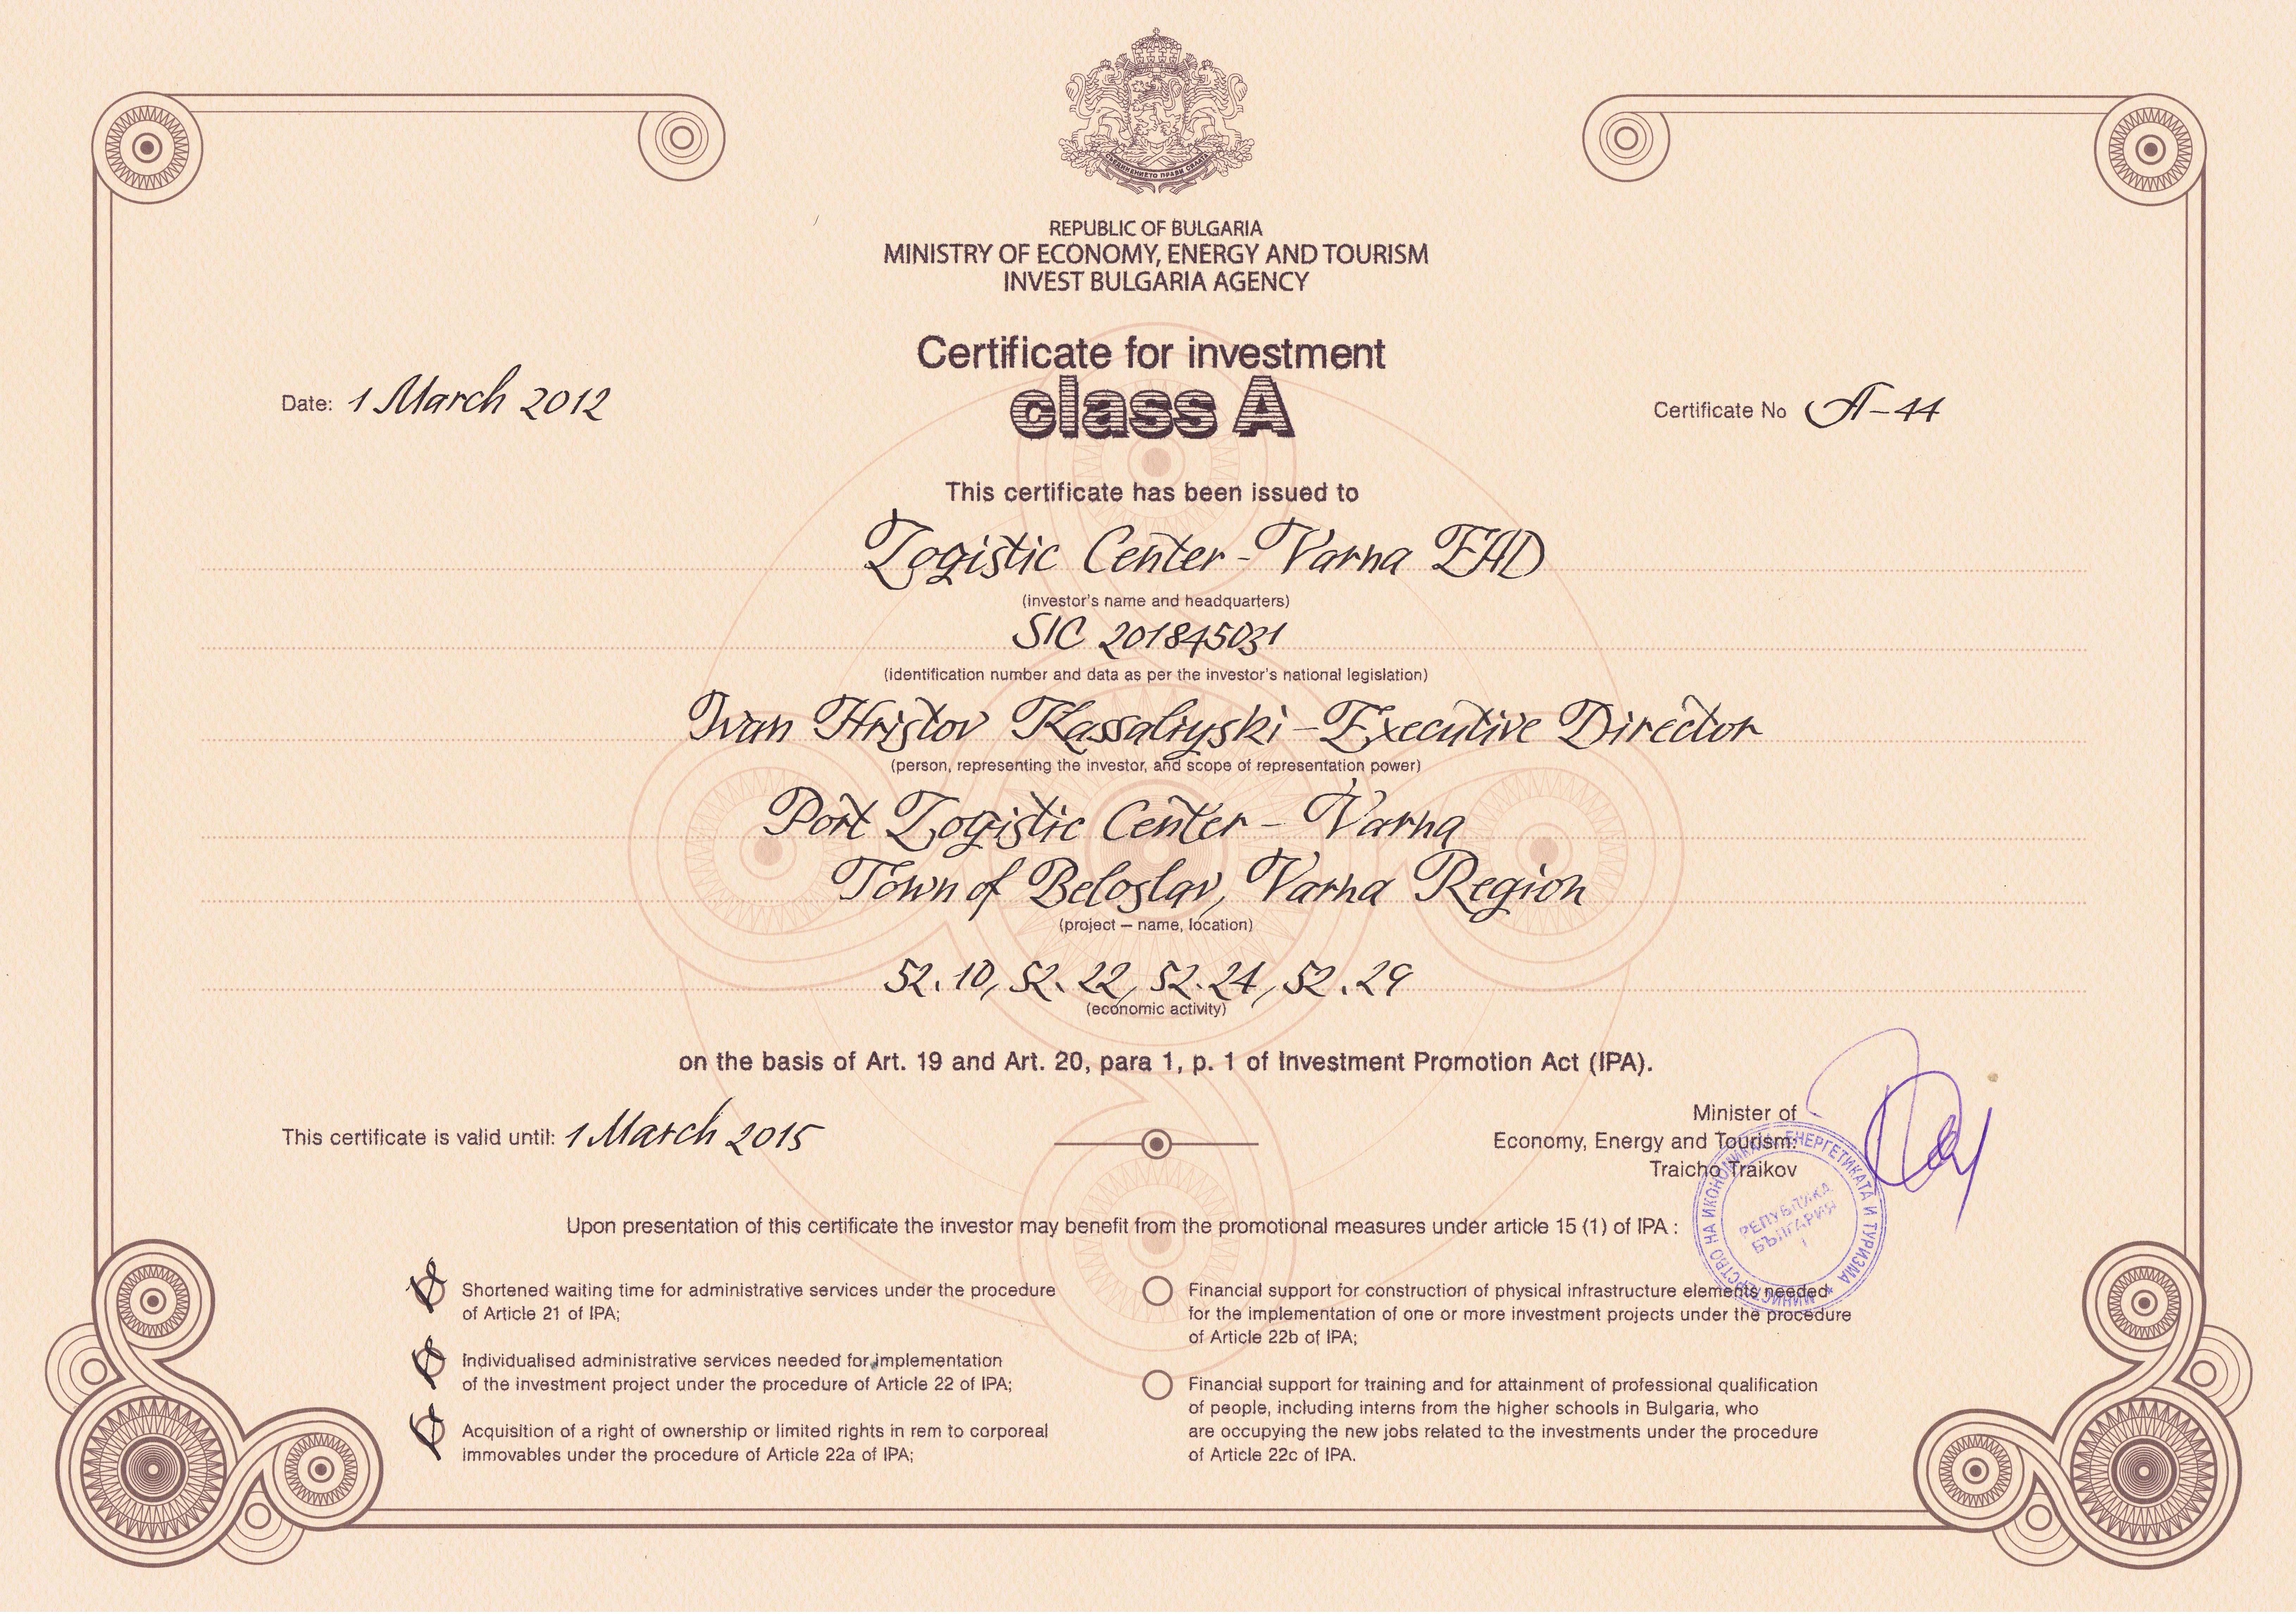 Permits Certificates Logistic Center Varna Ead